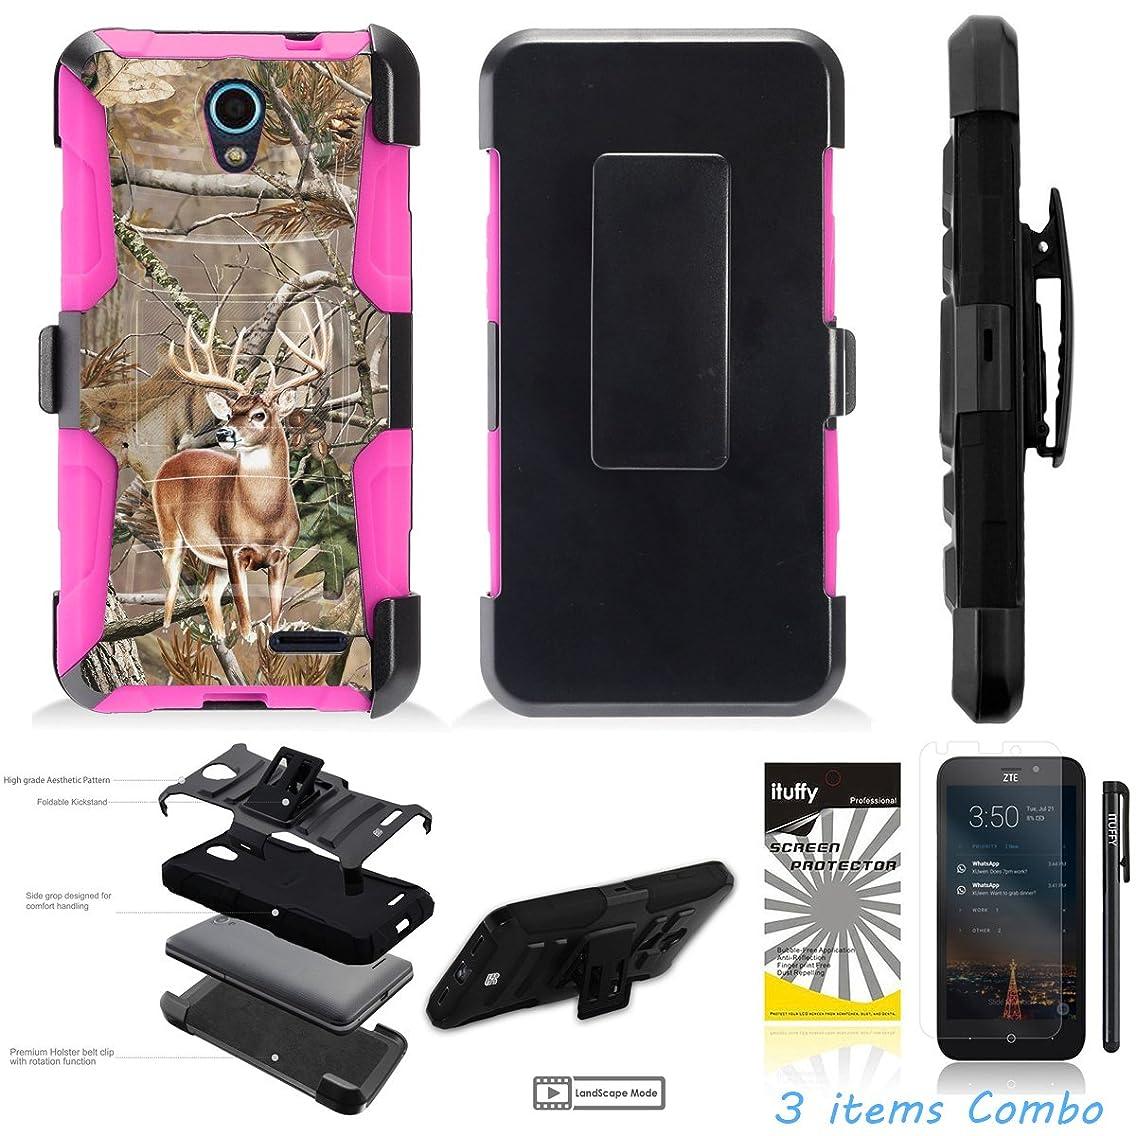 For ZTE MIDNIGHT PRO, ZTE ZFIVE 2nd GEN Z837VL Z836BL /3Items [Clear LCD Film]+Stylus Pen+[Impact Resistance] Dual Layer [Belt Clip] Holster Combo [KickStand] Phone Case Tree Deer Pink